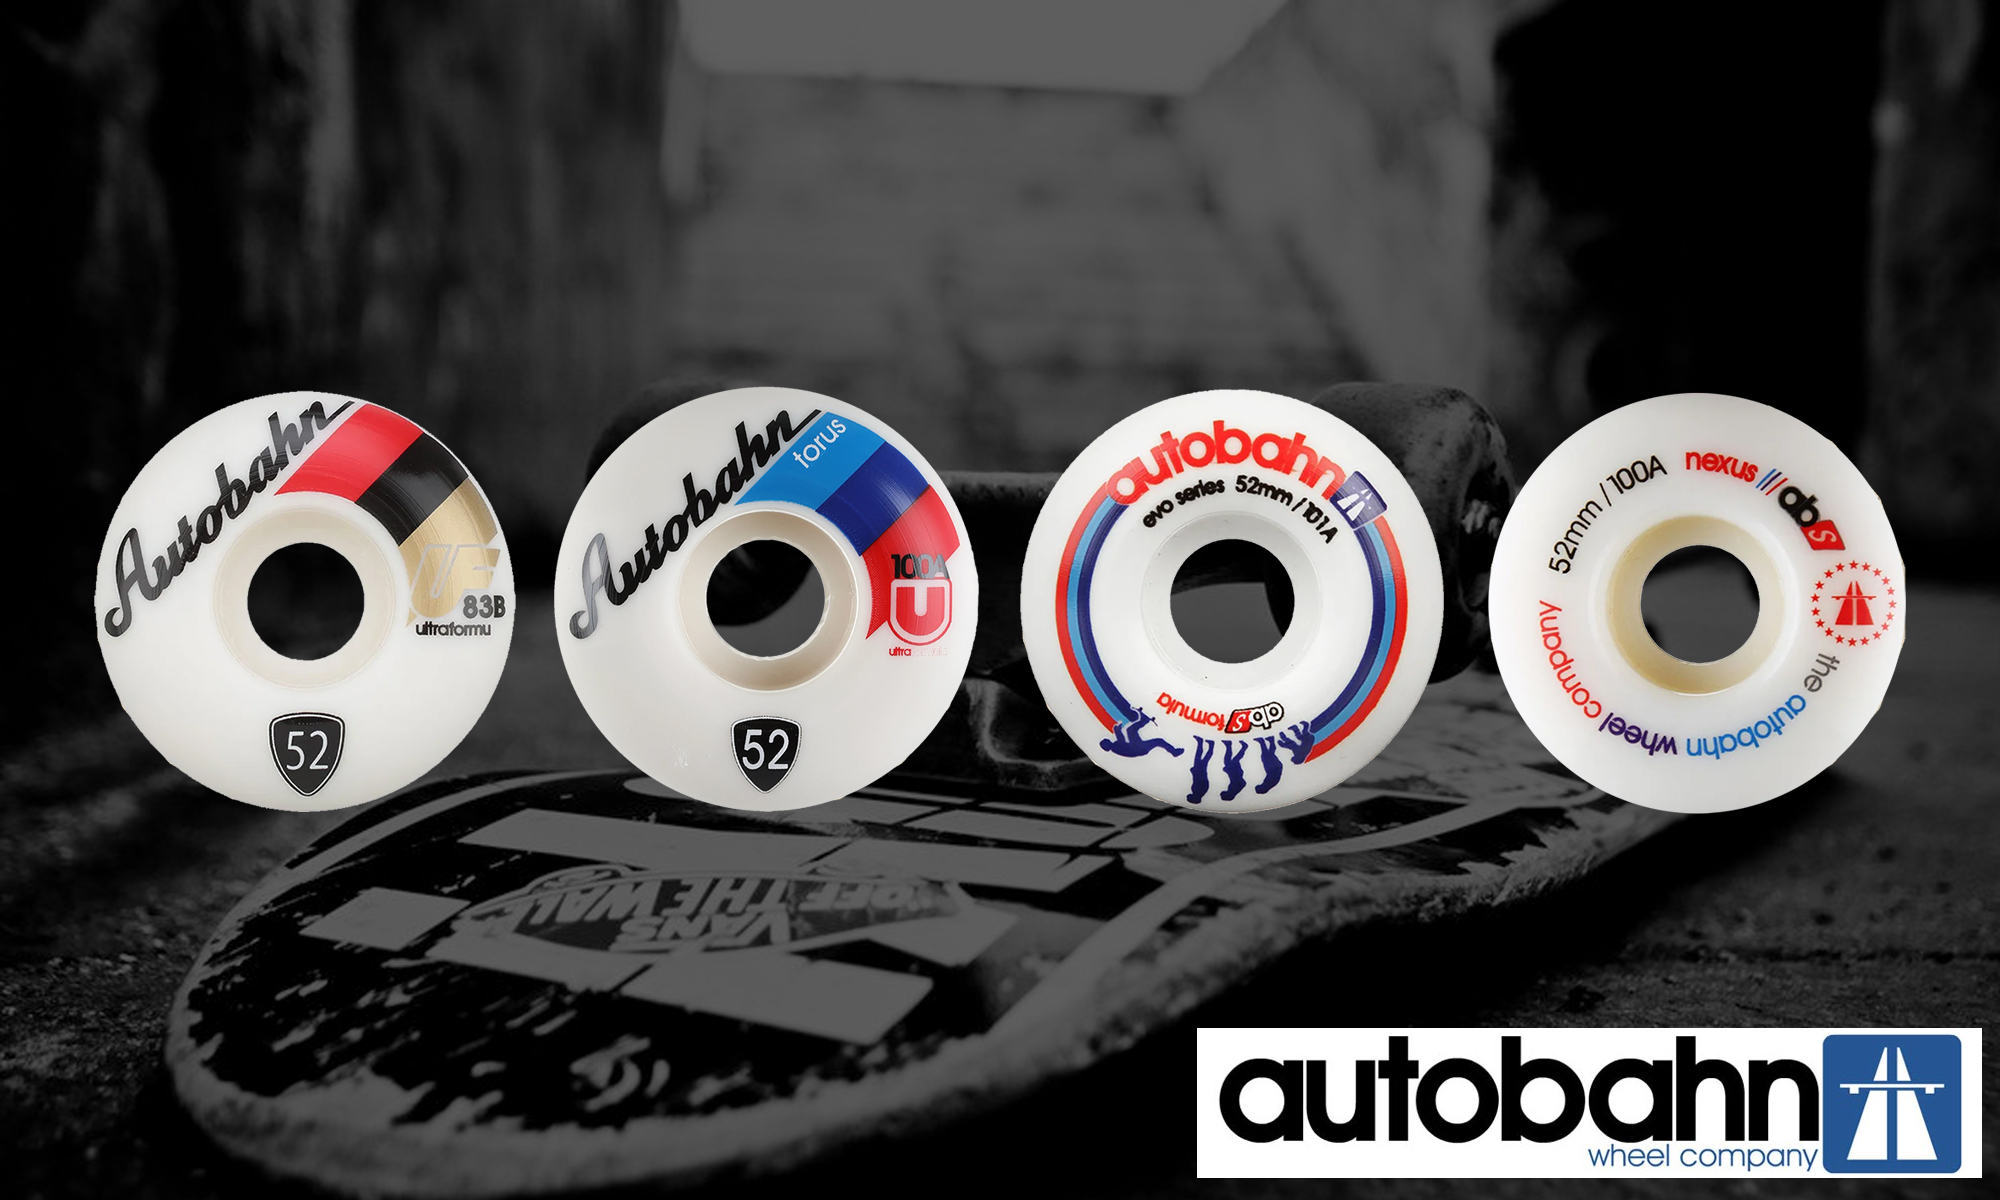 autobahn wheel pack nas121 mod for skater xl mod io autobahn wheel pack nas121 mod for